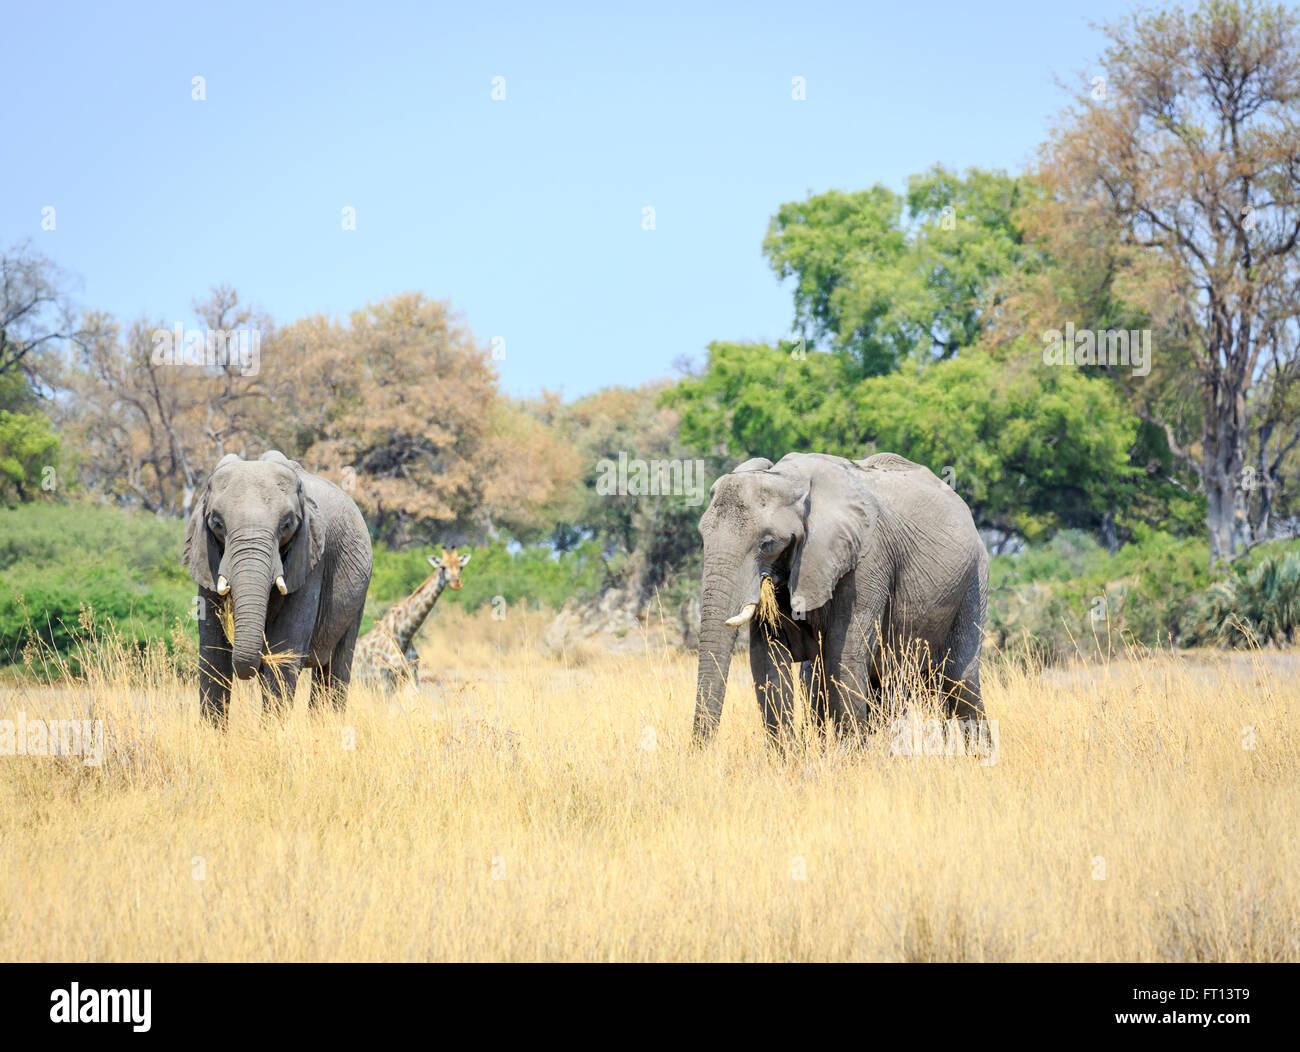 Two African bush elephants (Loxodonta africana) eating grass with giraffe behind, grassland landscape near Sandibe - Stock Image